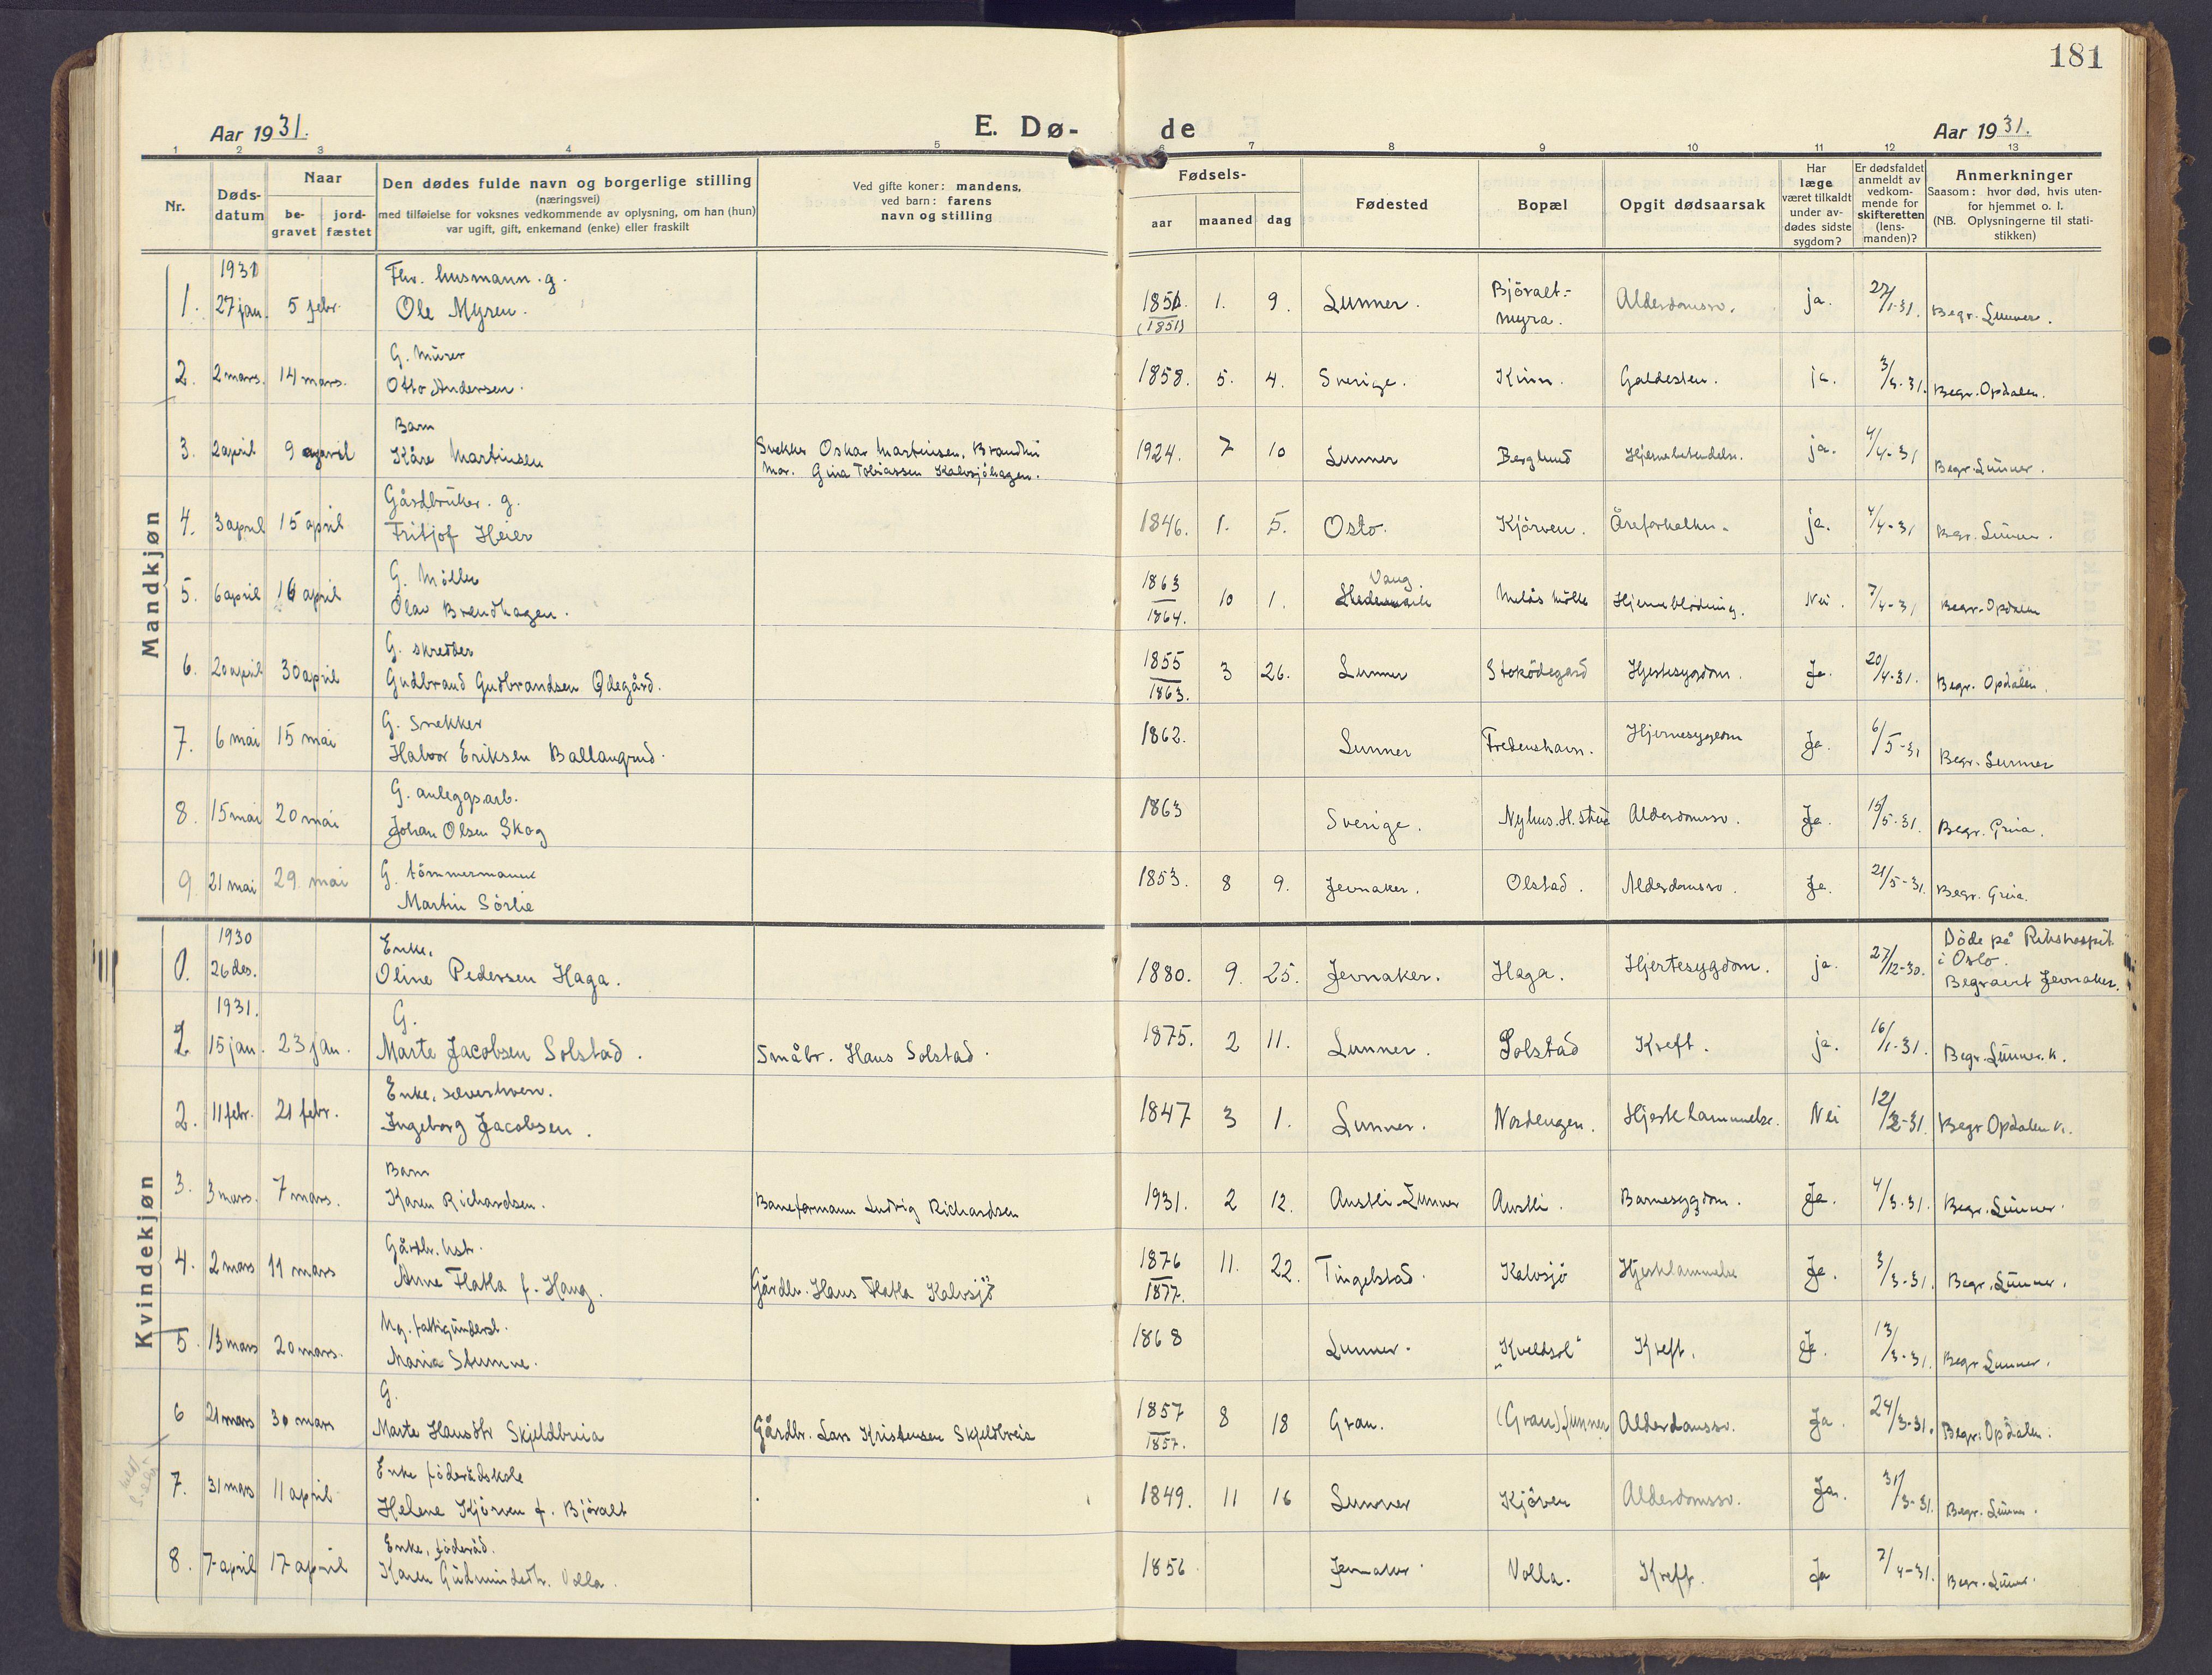 SAH, Lunner prestekontor, H/Ha/Haa/L0002: Ministerialbok nr. 2, 1922-1931, s. 181